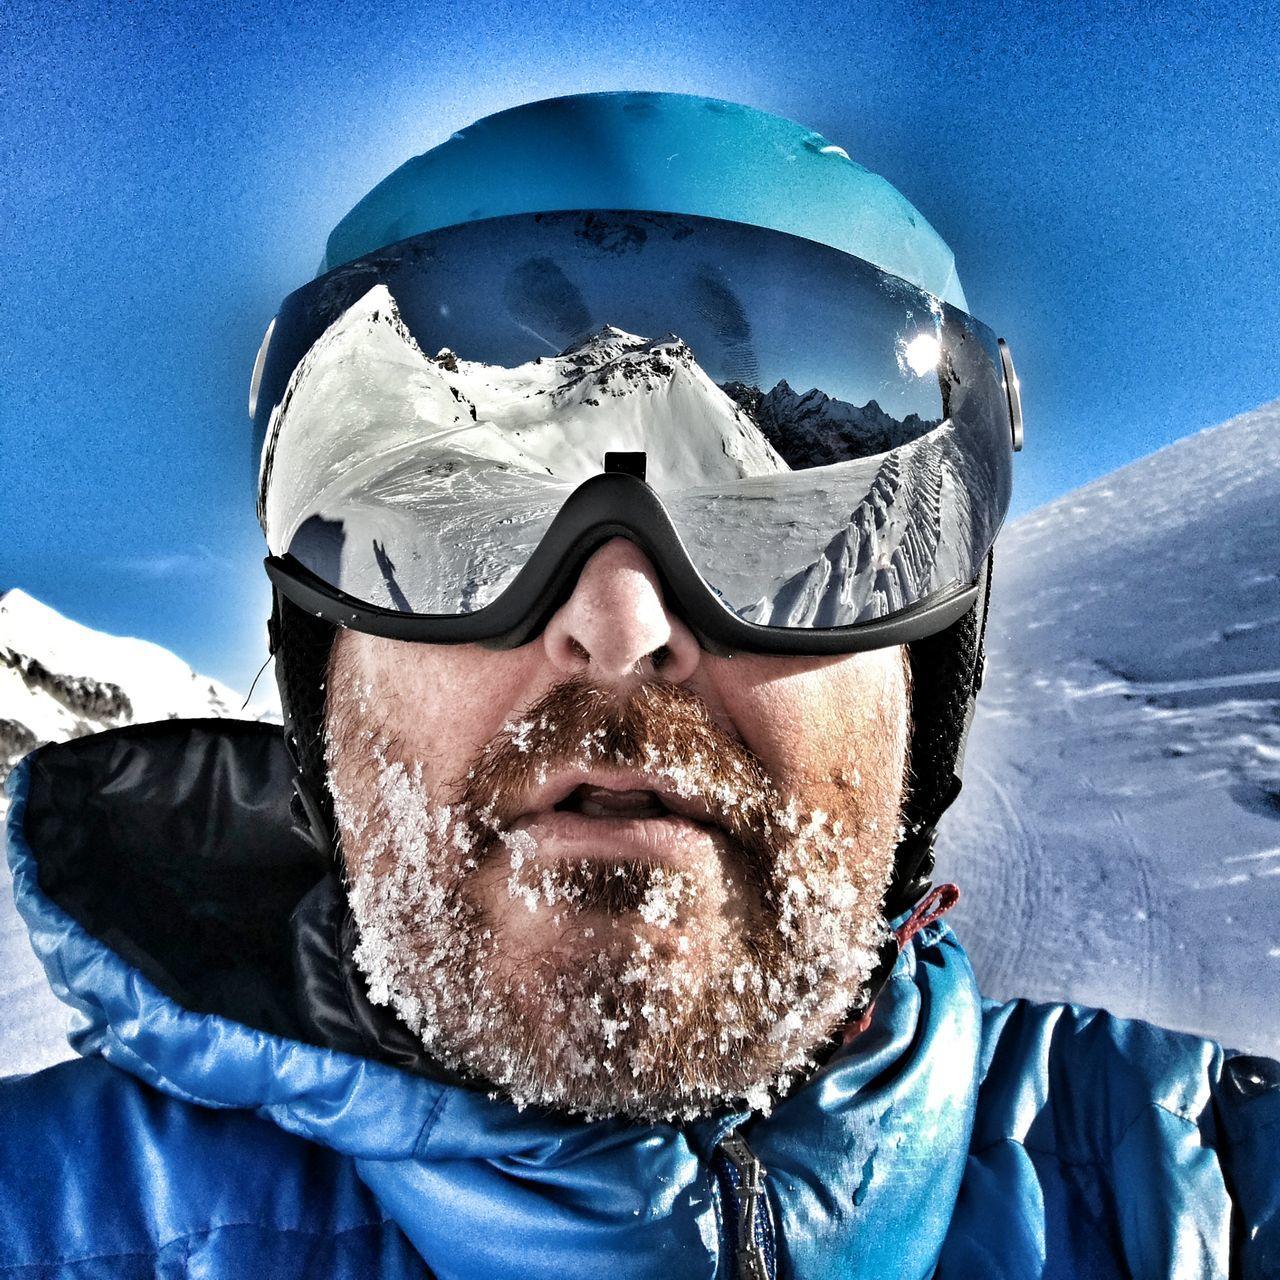 Outdoors Eye4photography  Sundayselfie Selfıe Beard Reflection Blue Sunglasses Headshot Sky Eyem Best Shots Bernese Oberland Switzerland Selfies Nature Mountain Reflection Cold Temperature Amazing Place Mornings Schilthorn Skiing